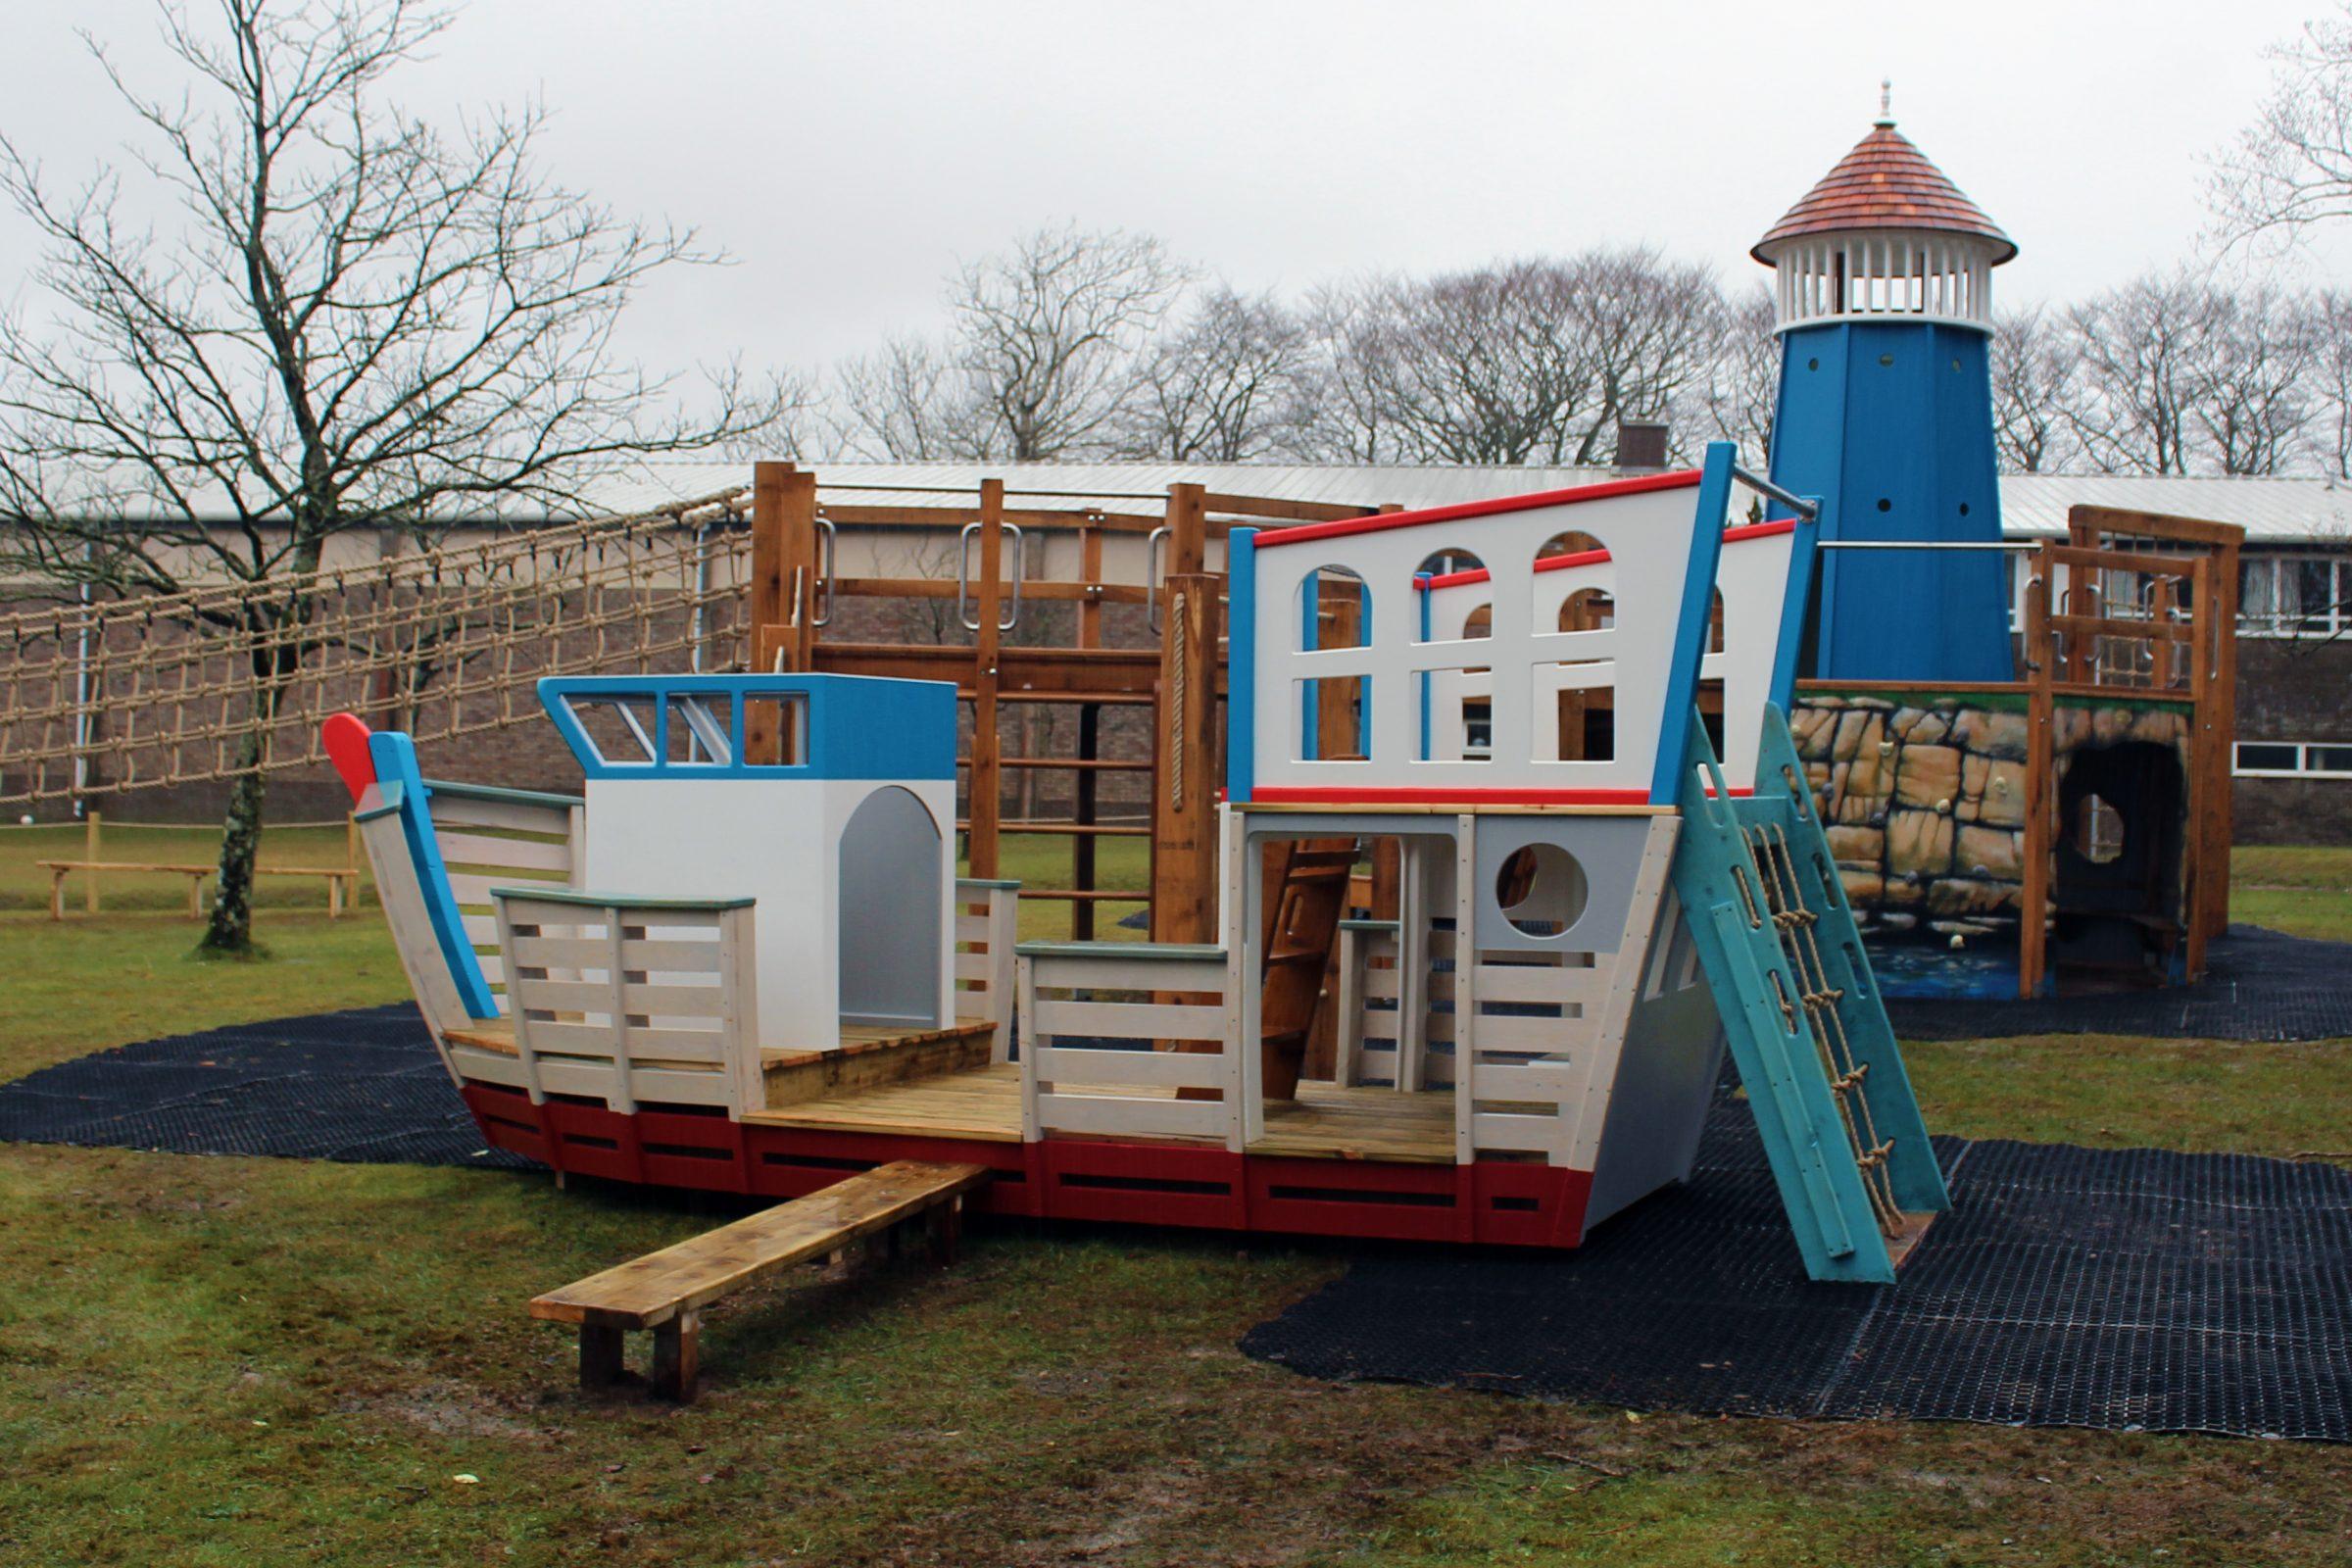 Shebbear School Ship and Lighthouse Play Area | Flights of